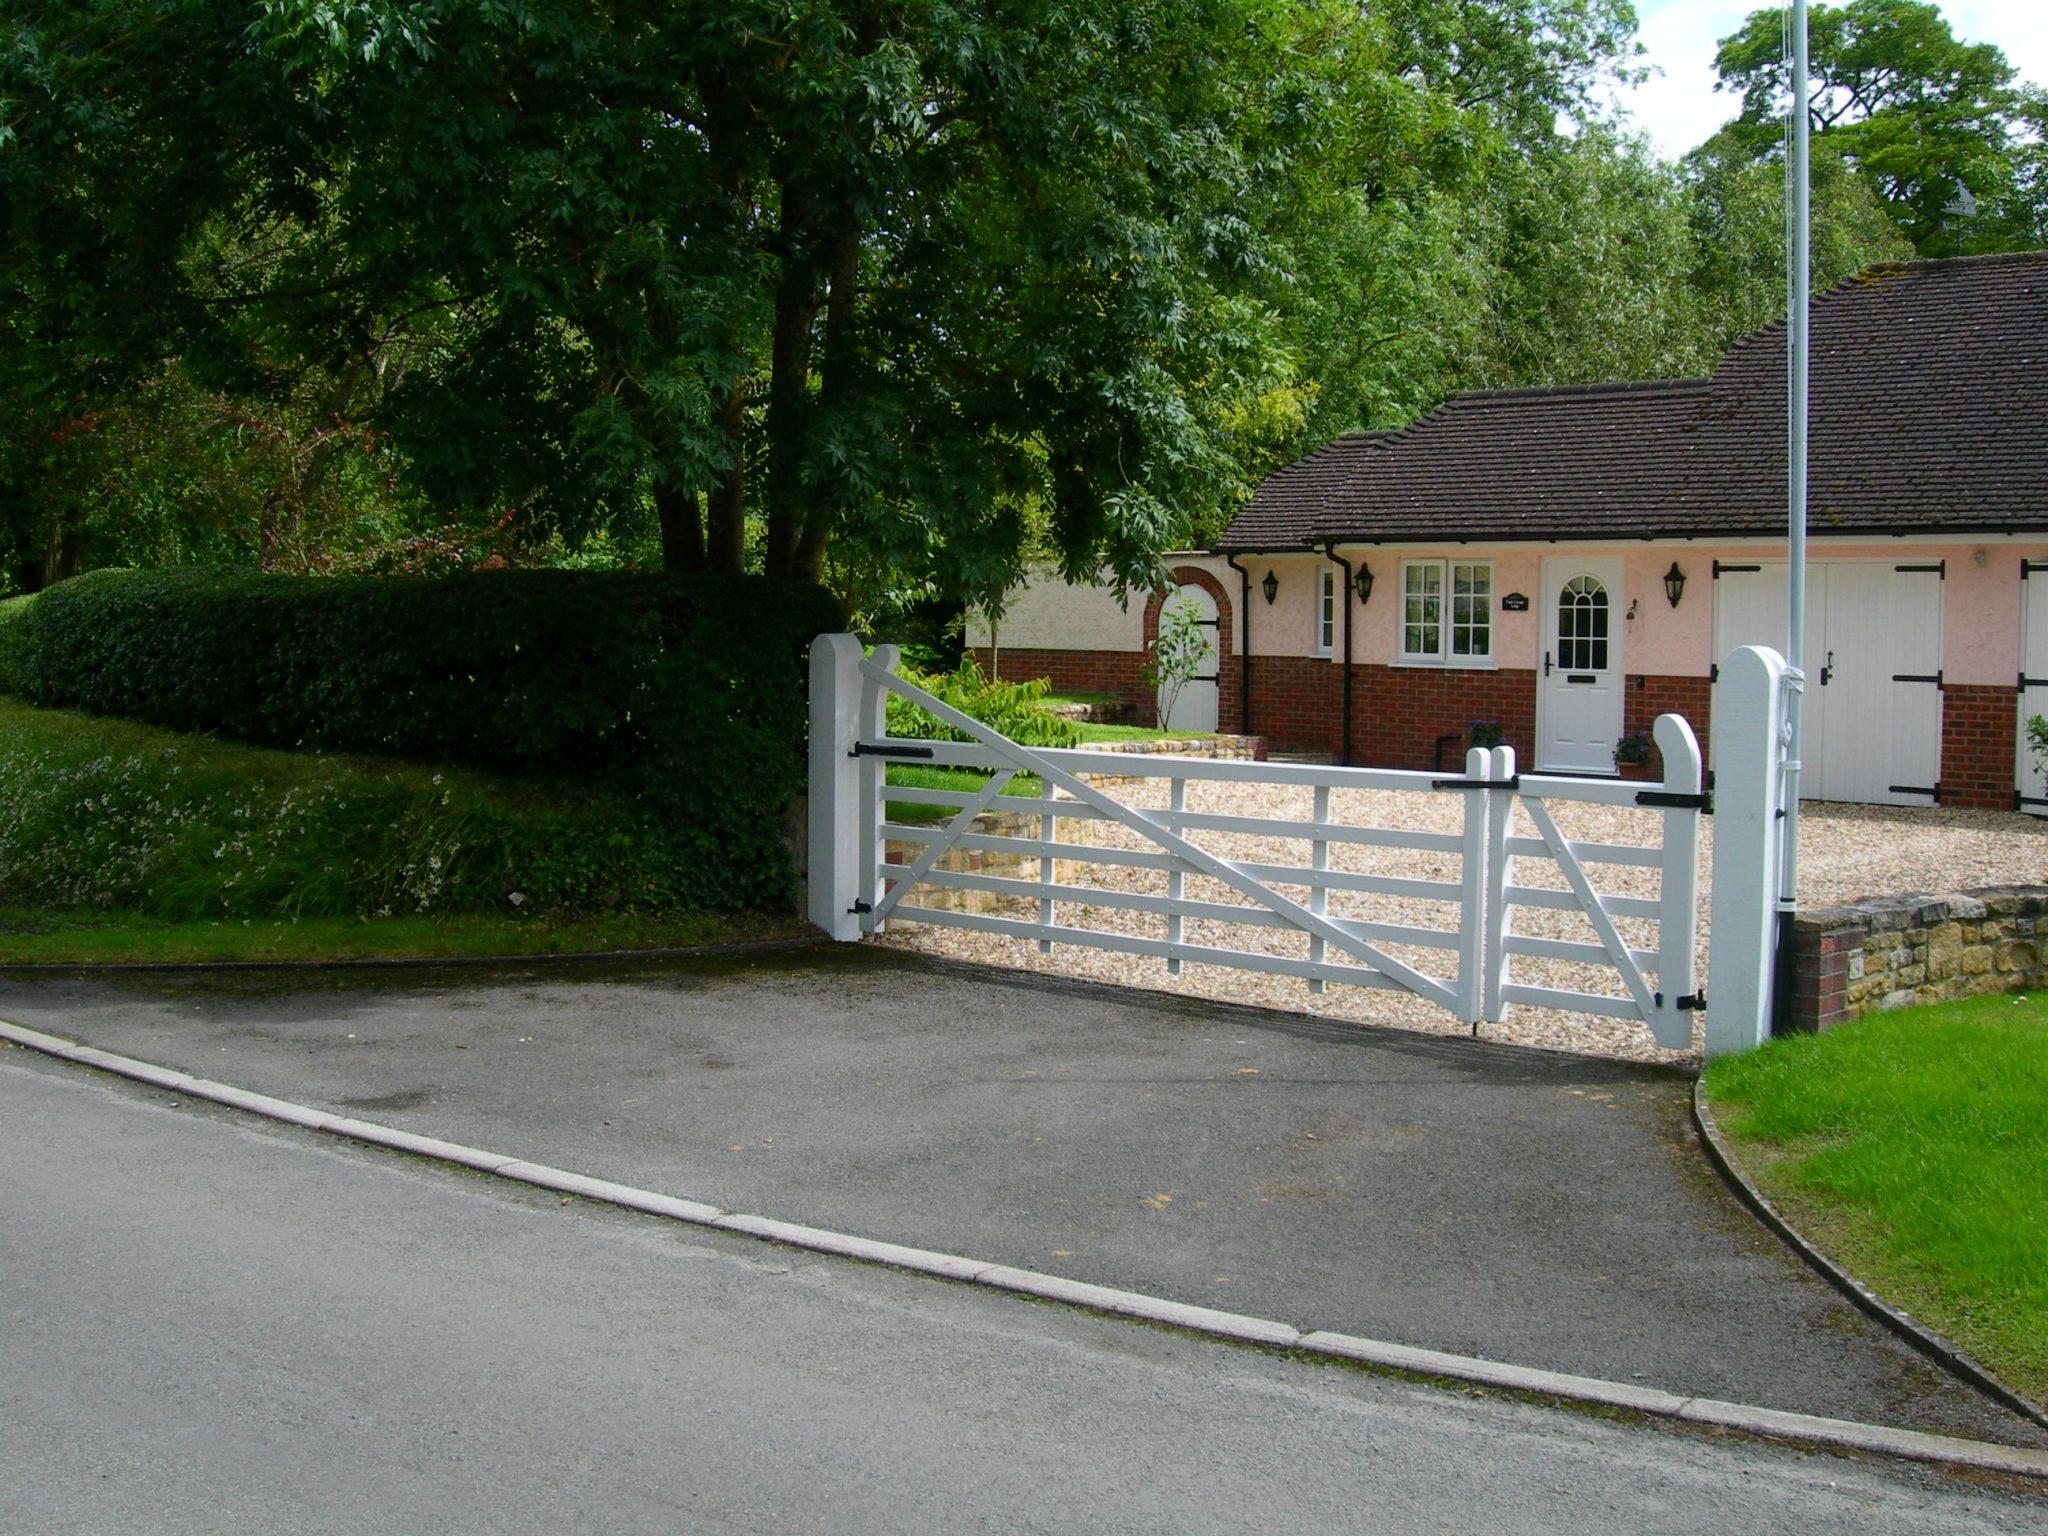 Property to rent, property to let, War minster, Pink Cottage Lodge Summer, John Loftus Property Centre